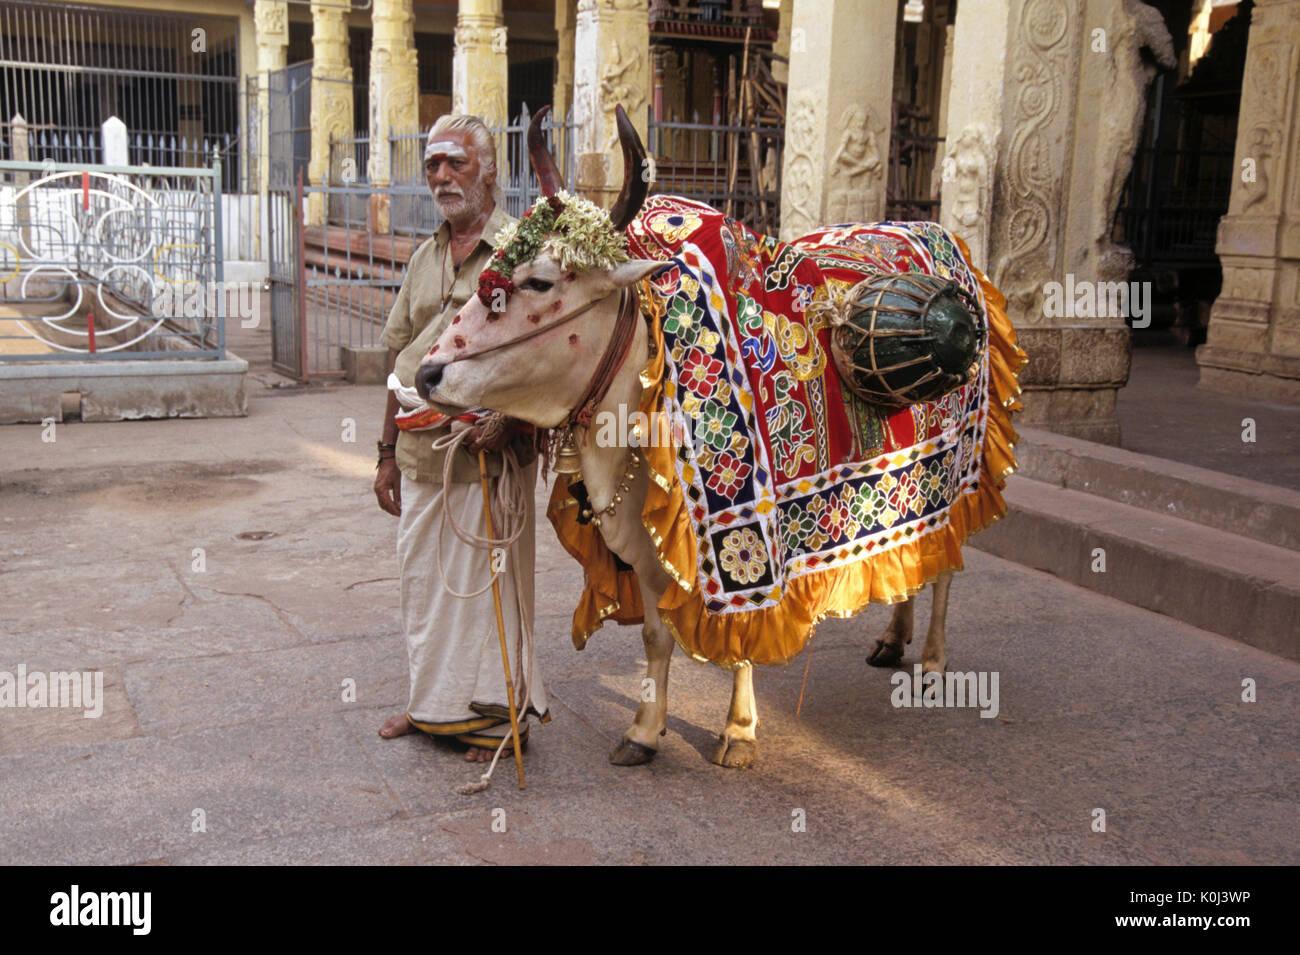 Man with fortune-telling bullock at Sri Meenakshi Hindu temple, Madurai, Tamil Nadu, India - Stock Image